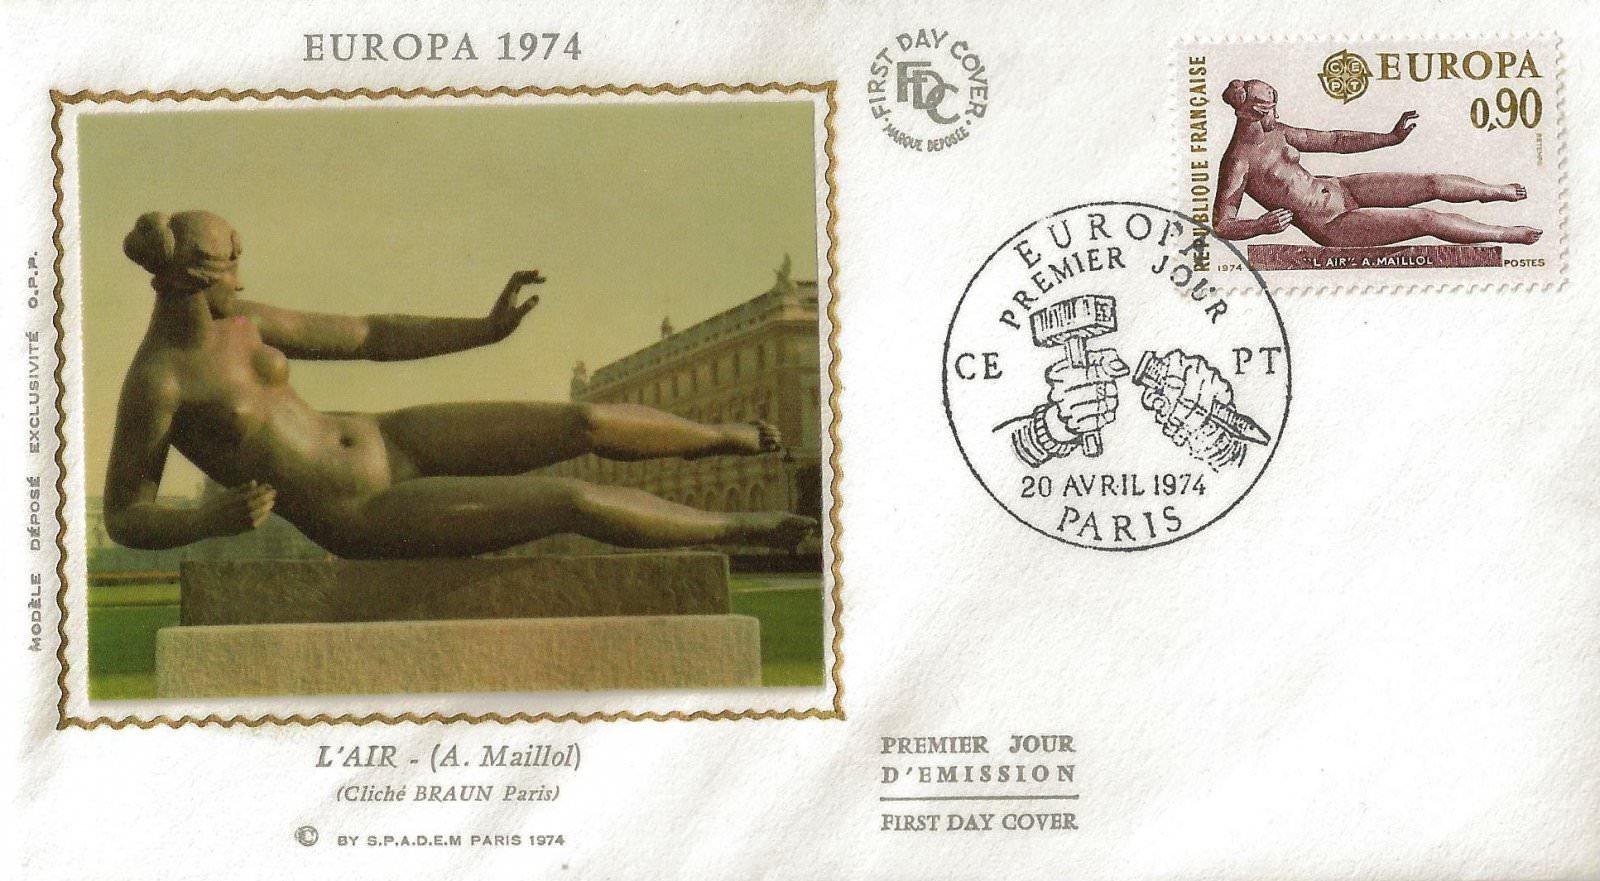 1974 EUROPA MAILLOL